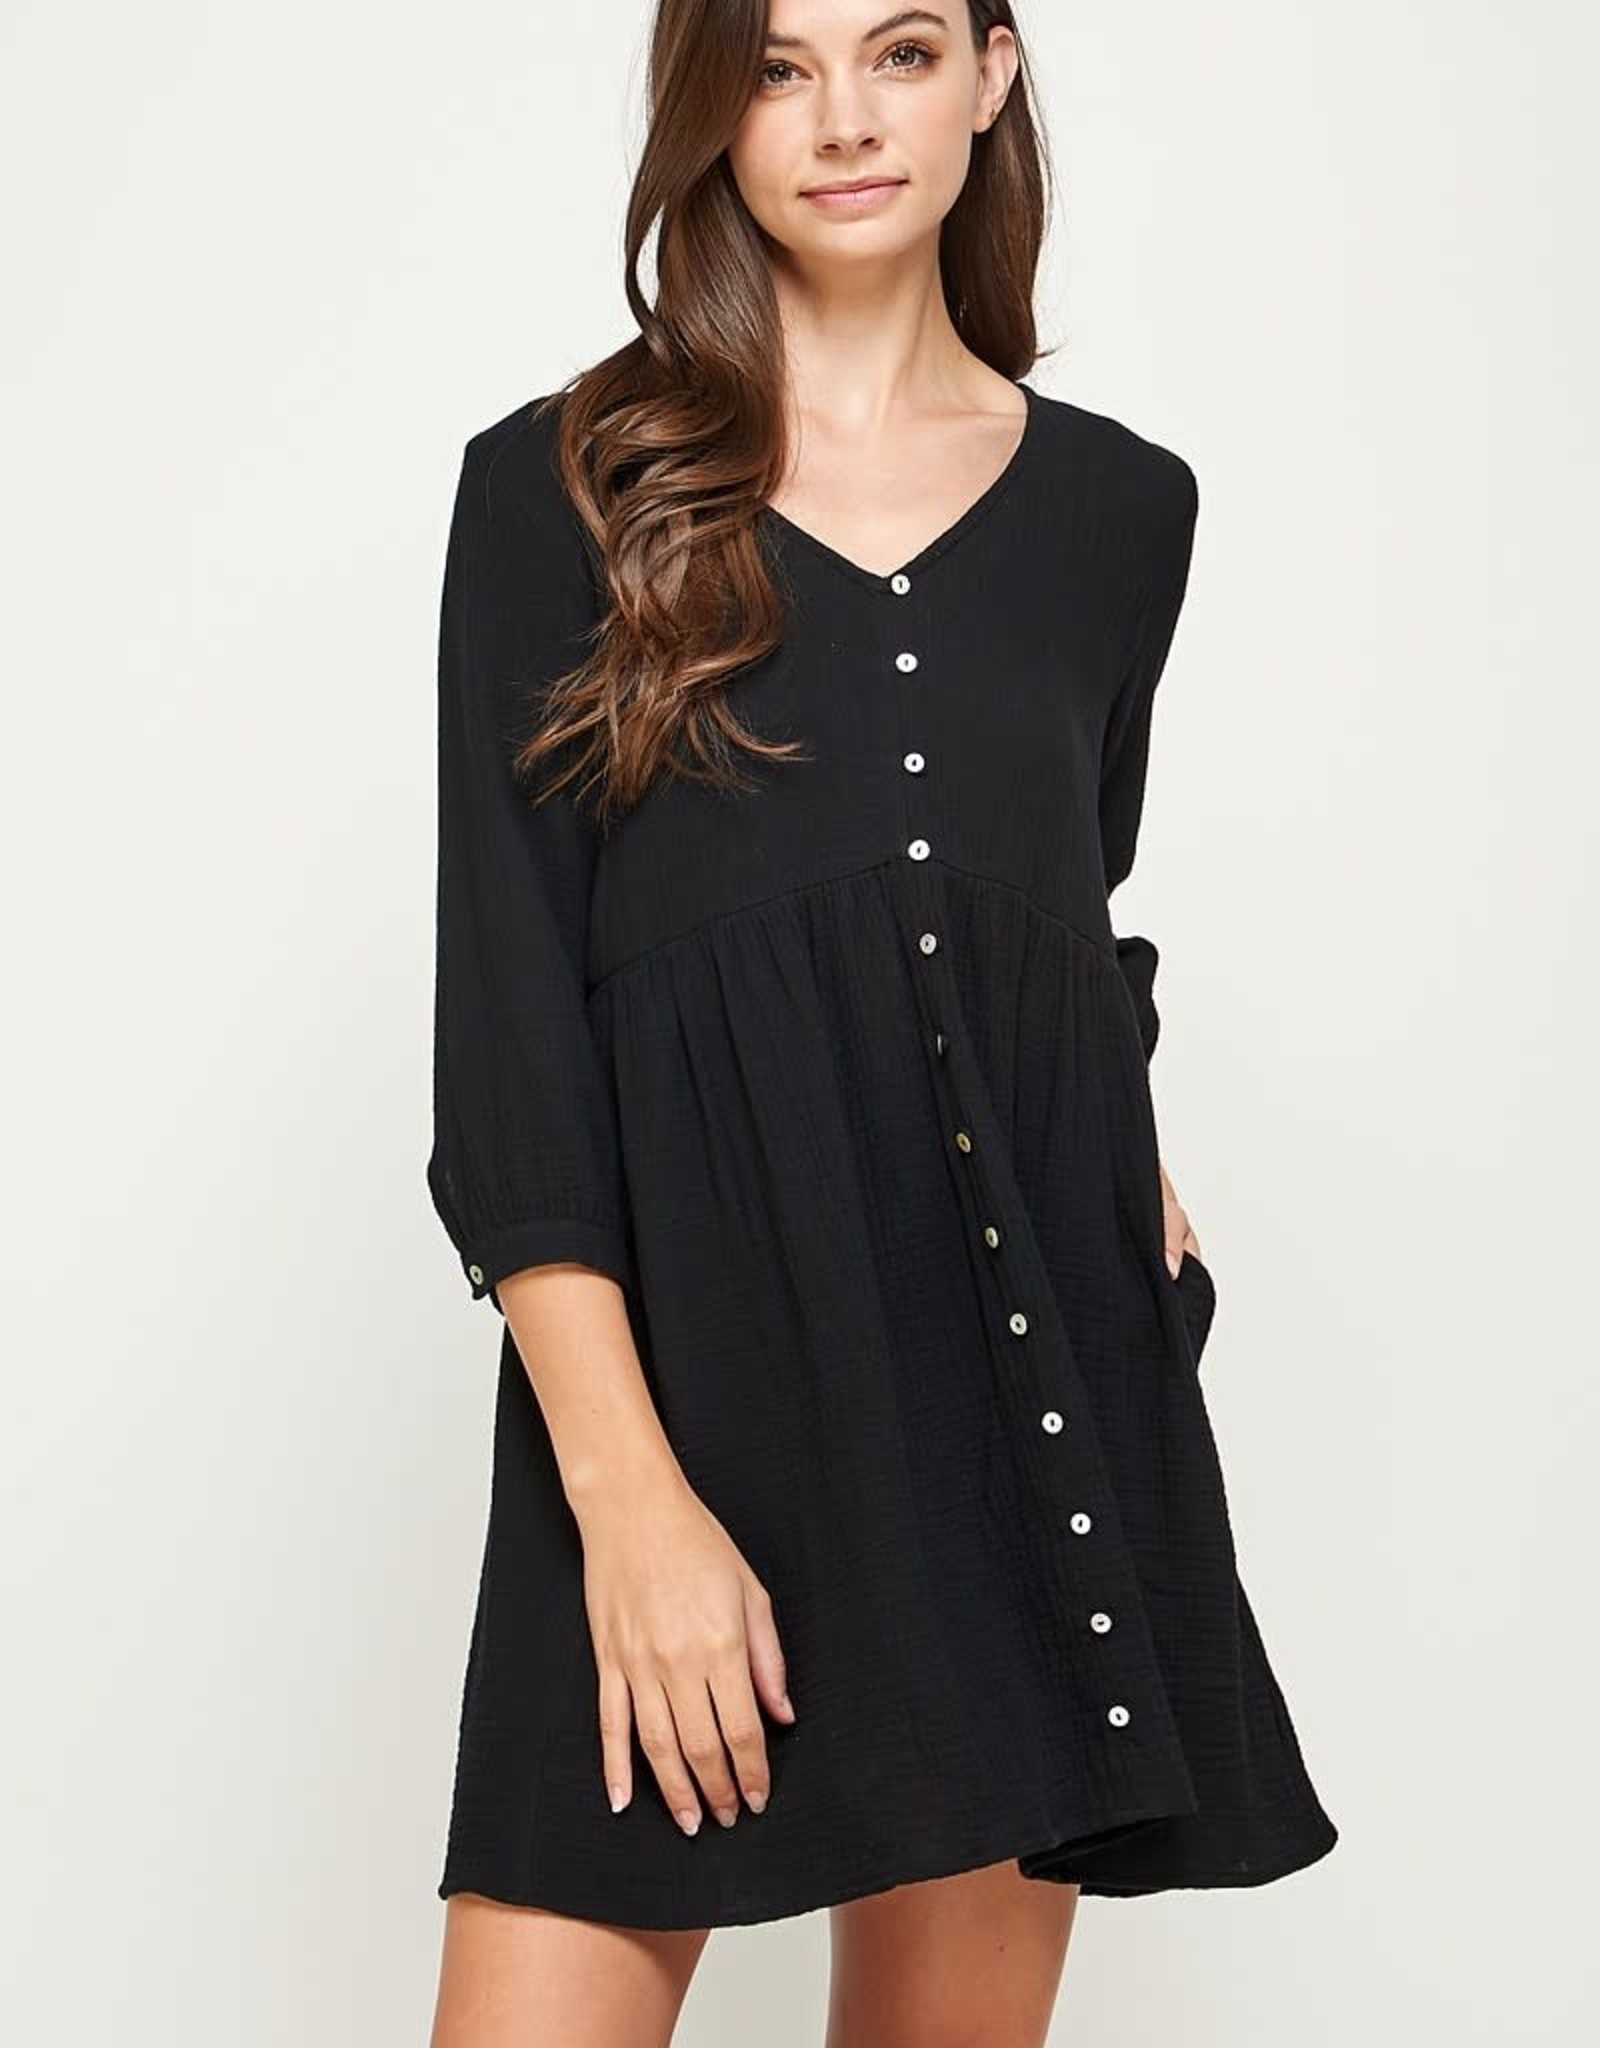 Miss Bliss Solid LS V Neck Dress- Black